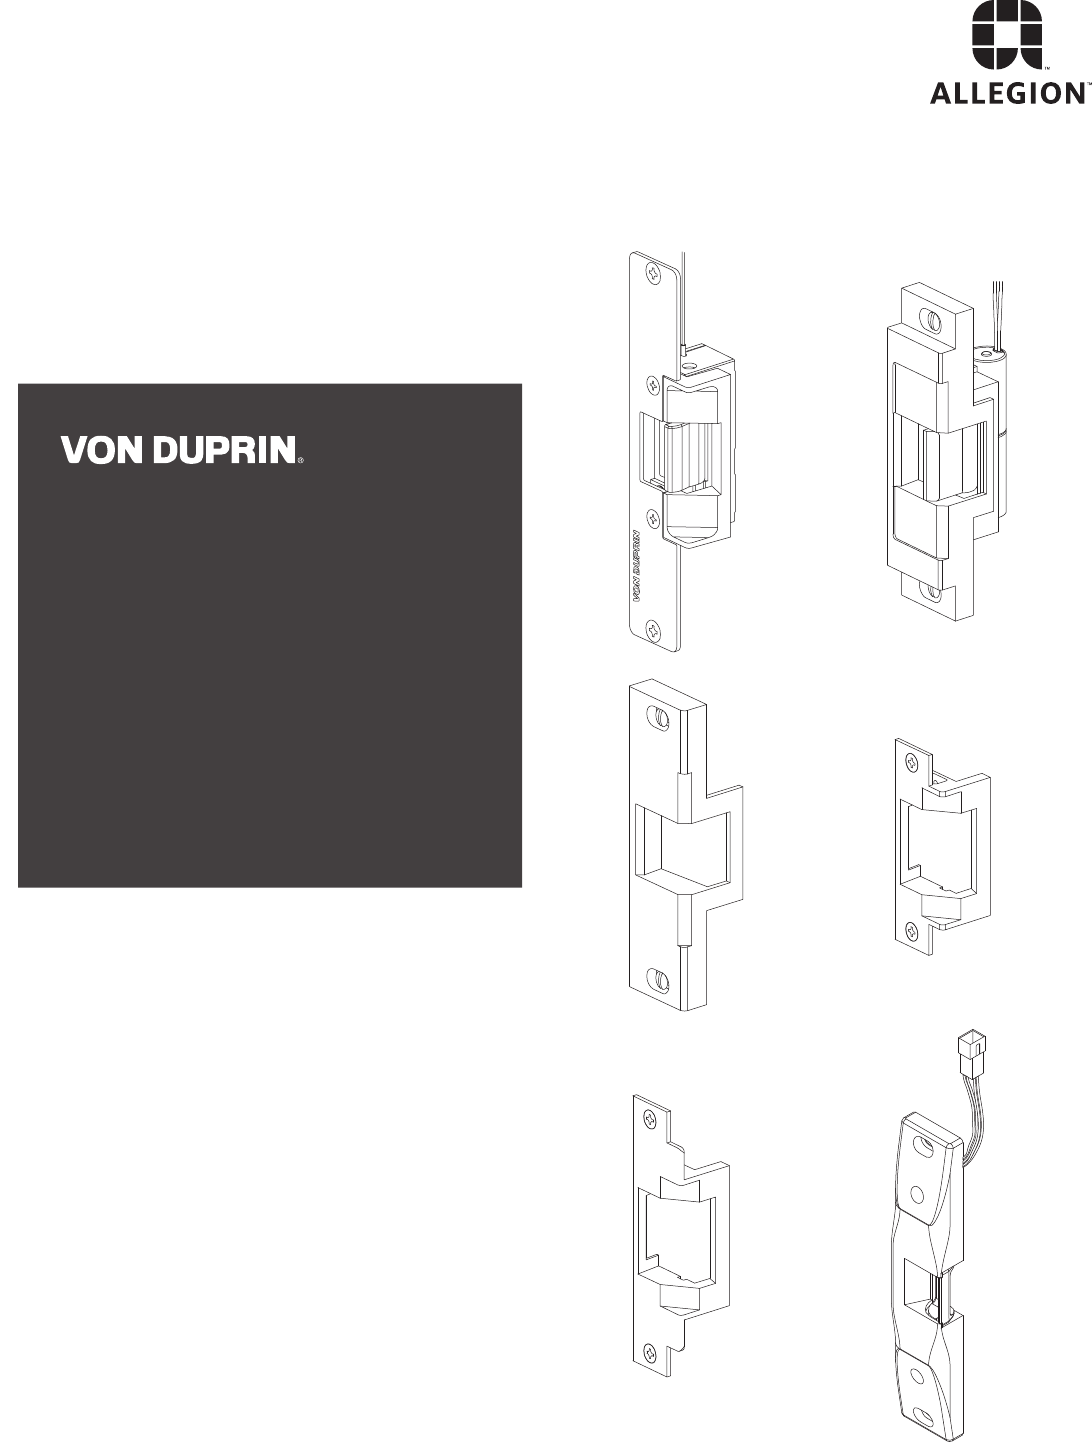 Von Duprin 5100/6100/6200/6300 Series Electric Strikes Parts Manual 108727   Von Duprin 6300 Wire Diagram      UserManual.wiki